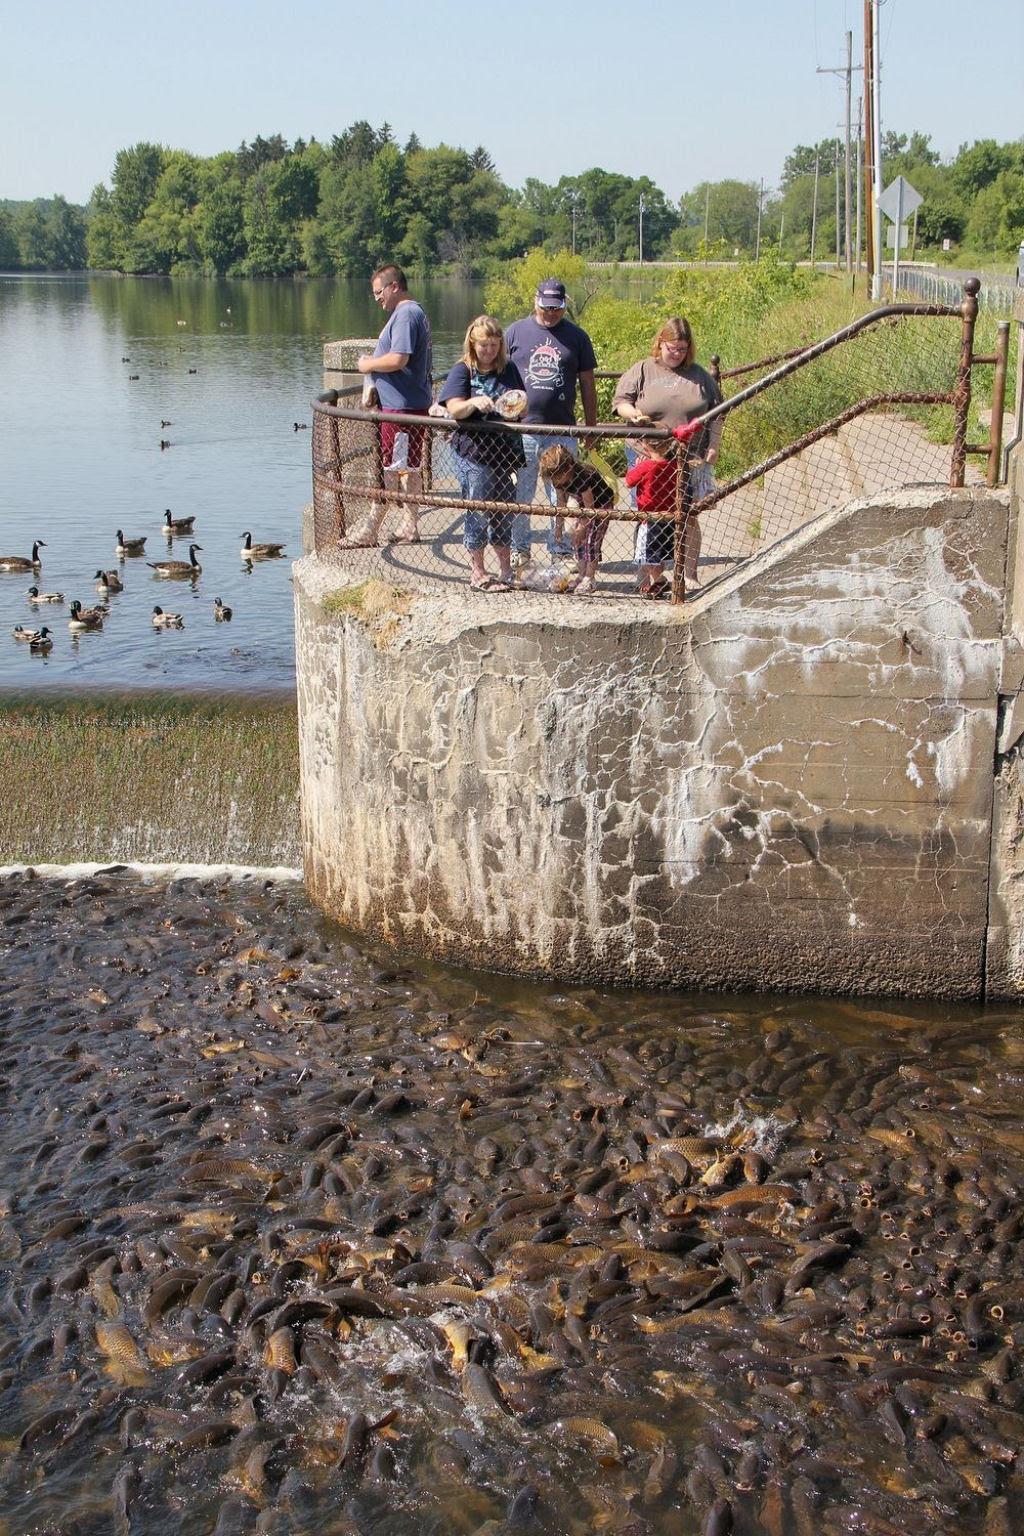 O vertedouro de Linesville: onde os patos caminham sobre peixes 04